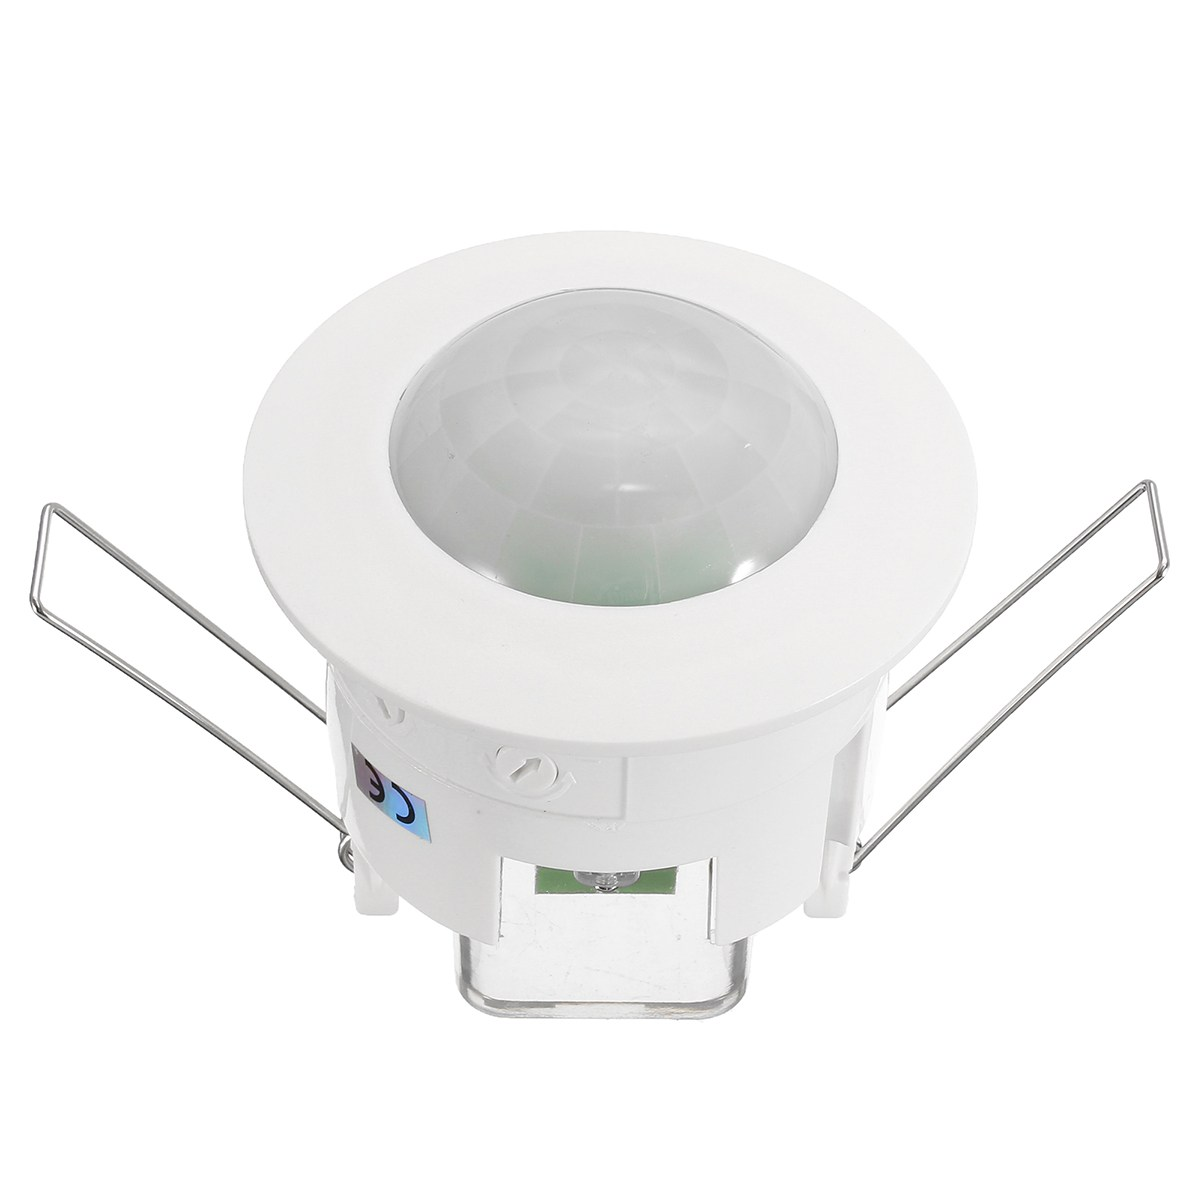 купить Safurance 360 Degree Recessed Ceiling Occupancy Body Infrared Motion Sensor Sensitive Swit Home Security по цене 459.84 рублей